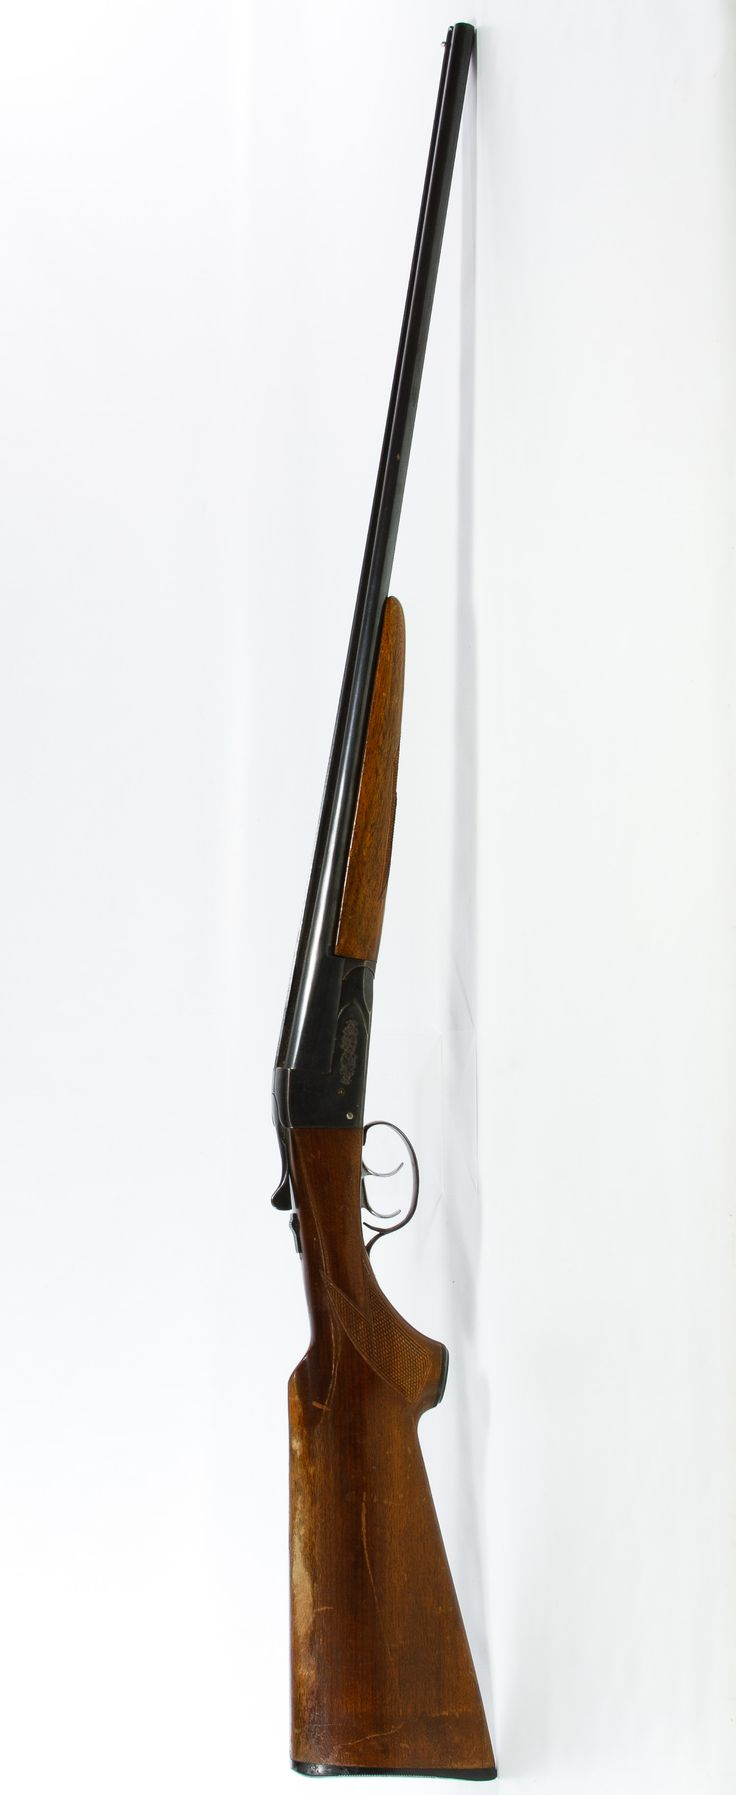 Lot 363: Savage Arms Model B .410ga. Double Barrel Shotgun (no serial #); Top break side by side double barrel shotgun